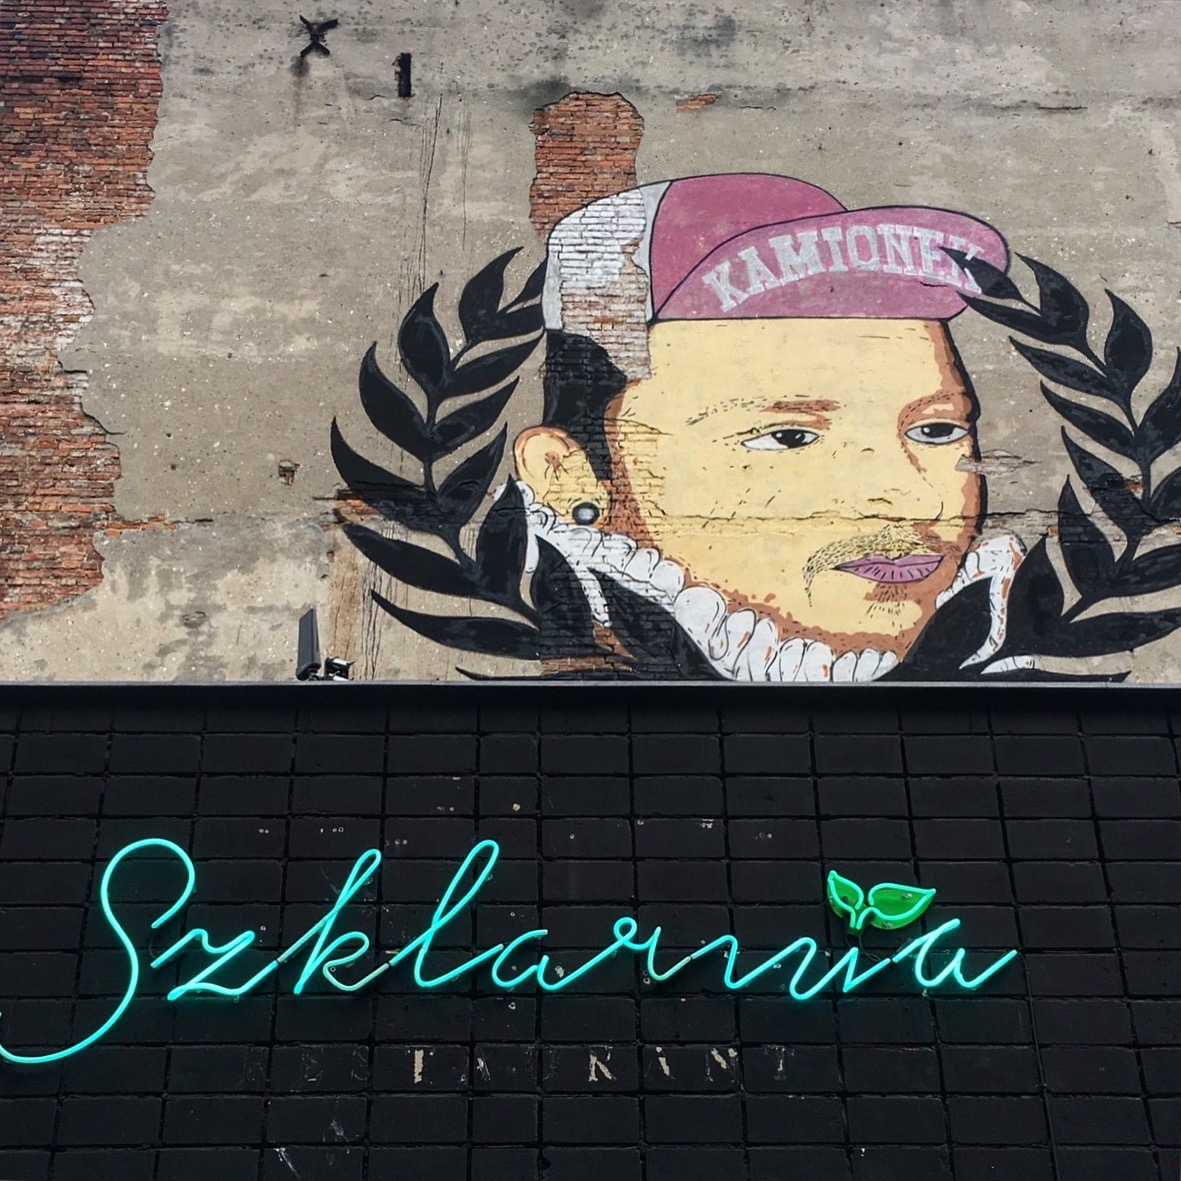 Soho_Restaurant_Szklarmia.jpg